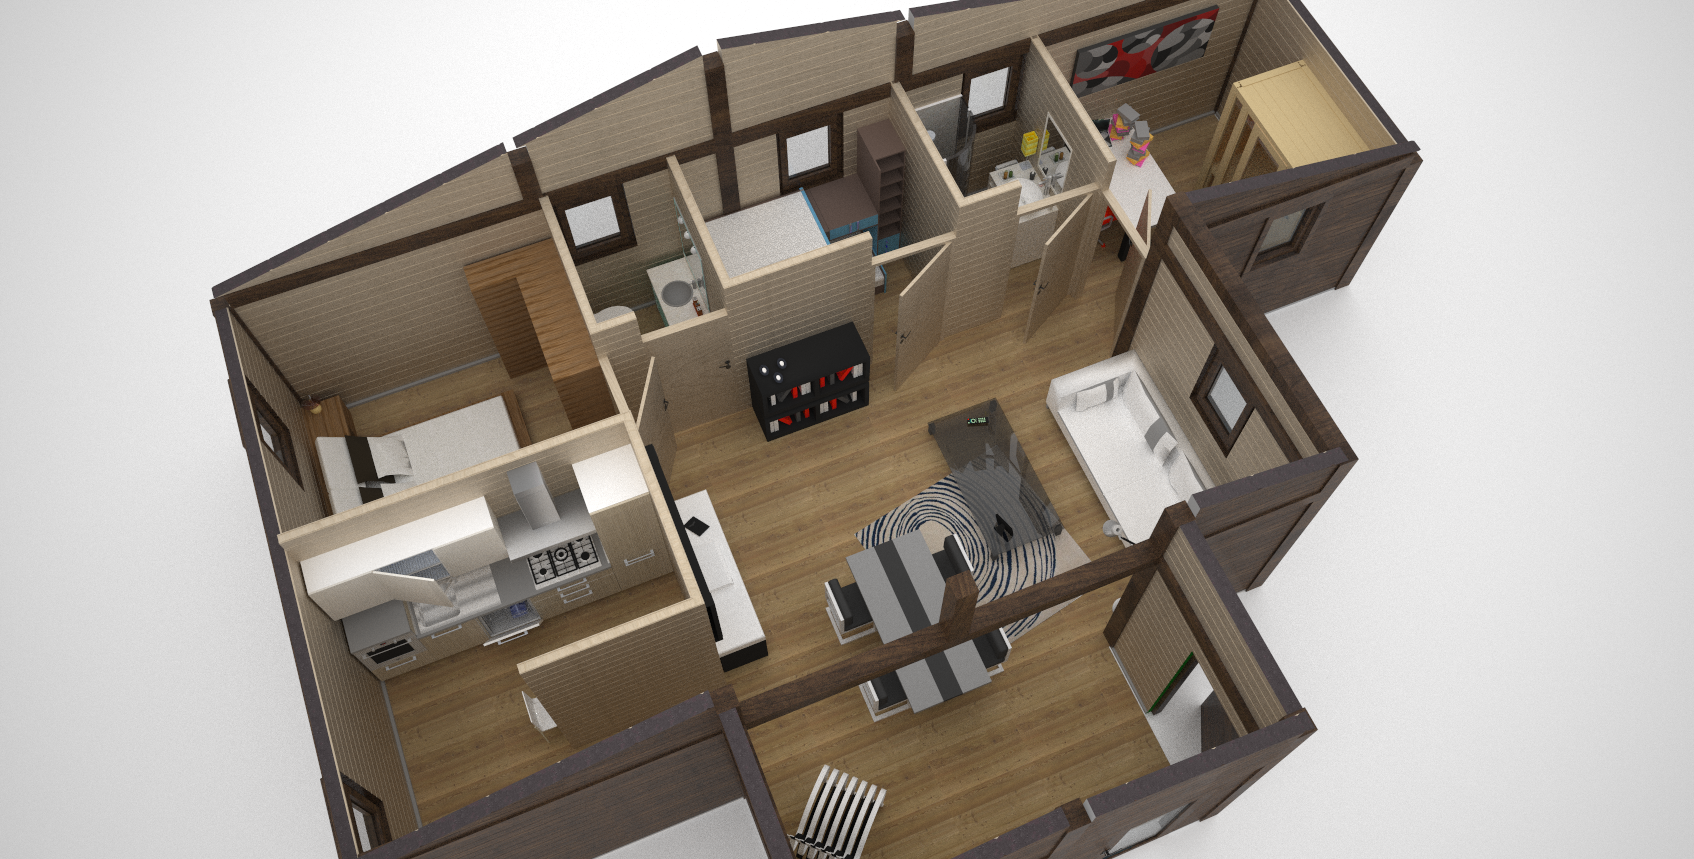 Interni Case Prefabbricate In Legno bungalow in legno - case abitabili in legno - edil legno